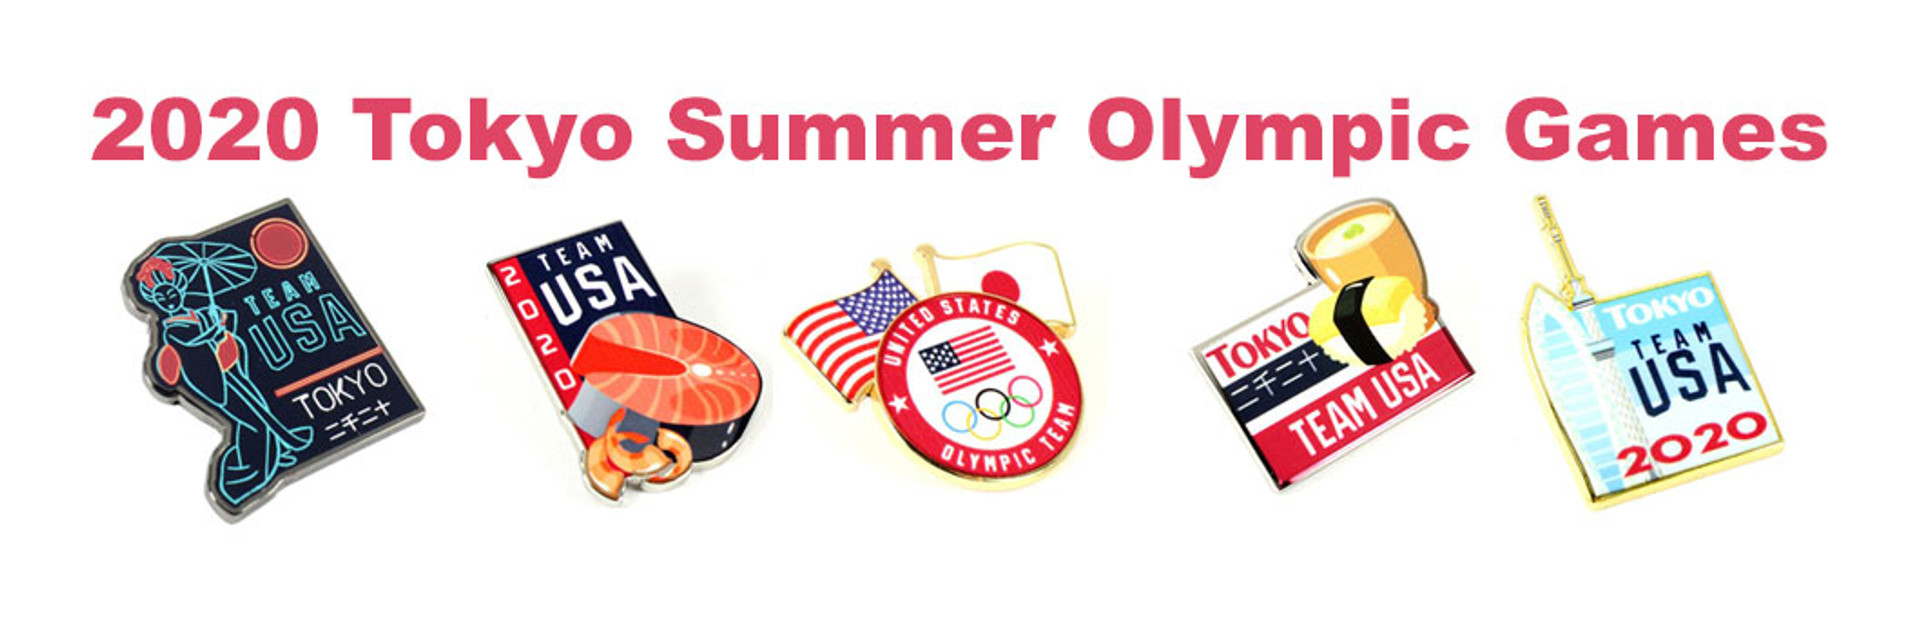 Tokyo 2020 Olympic pins